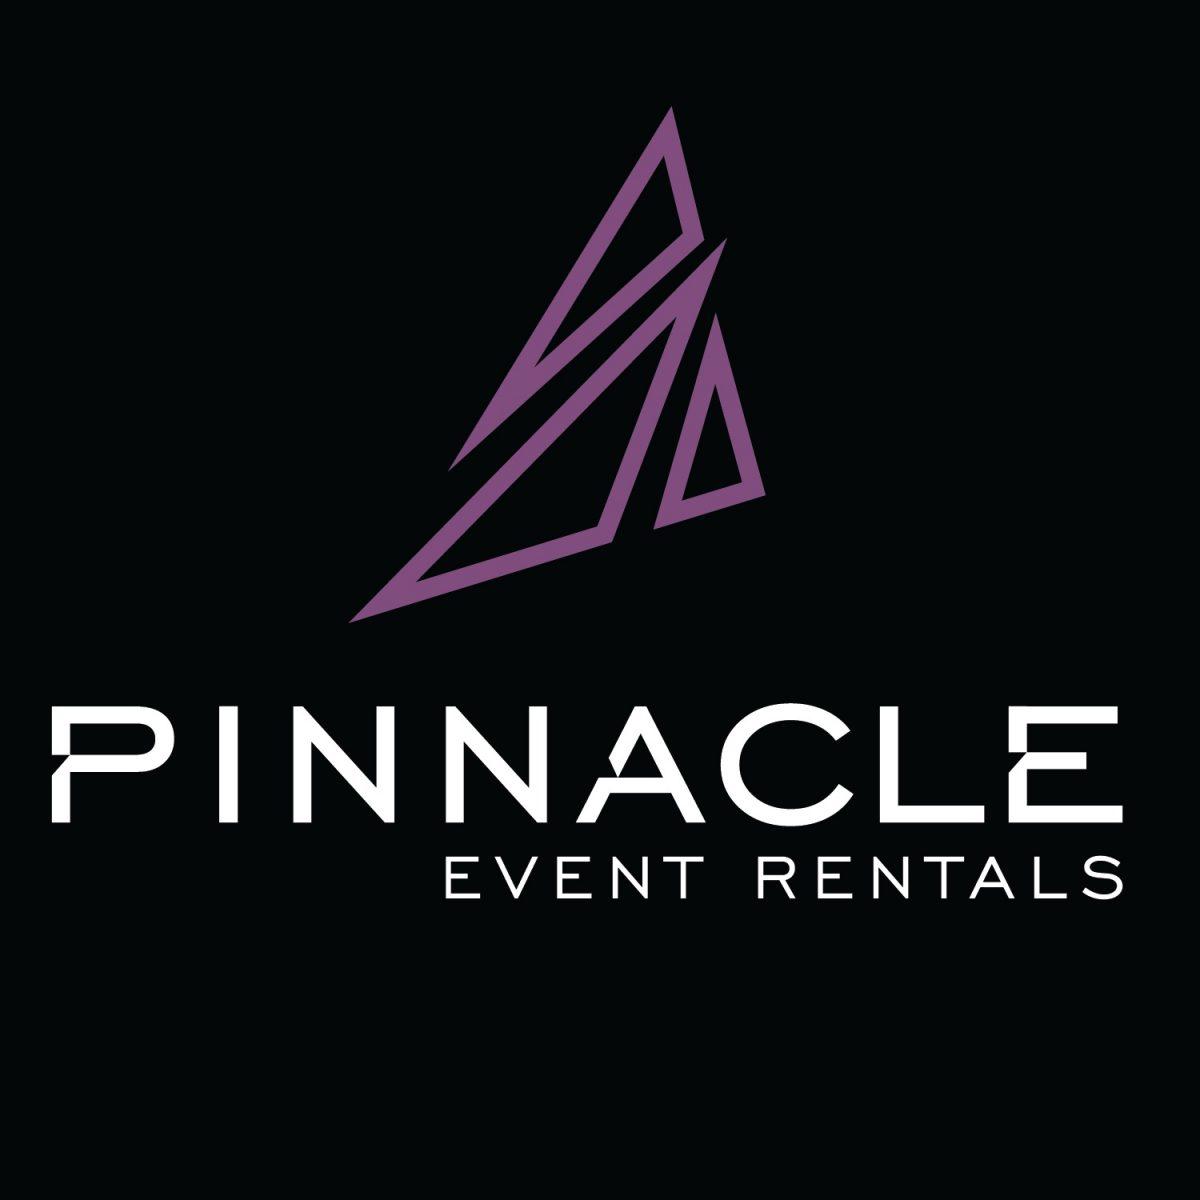 Pinnacle Event Rentals